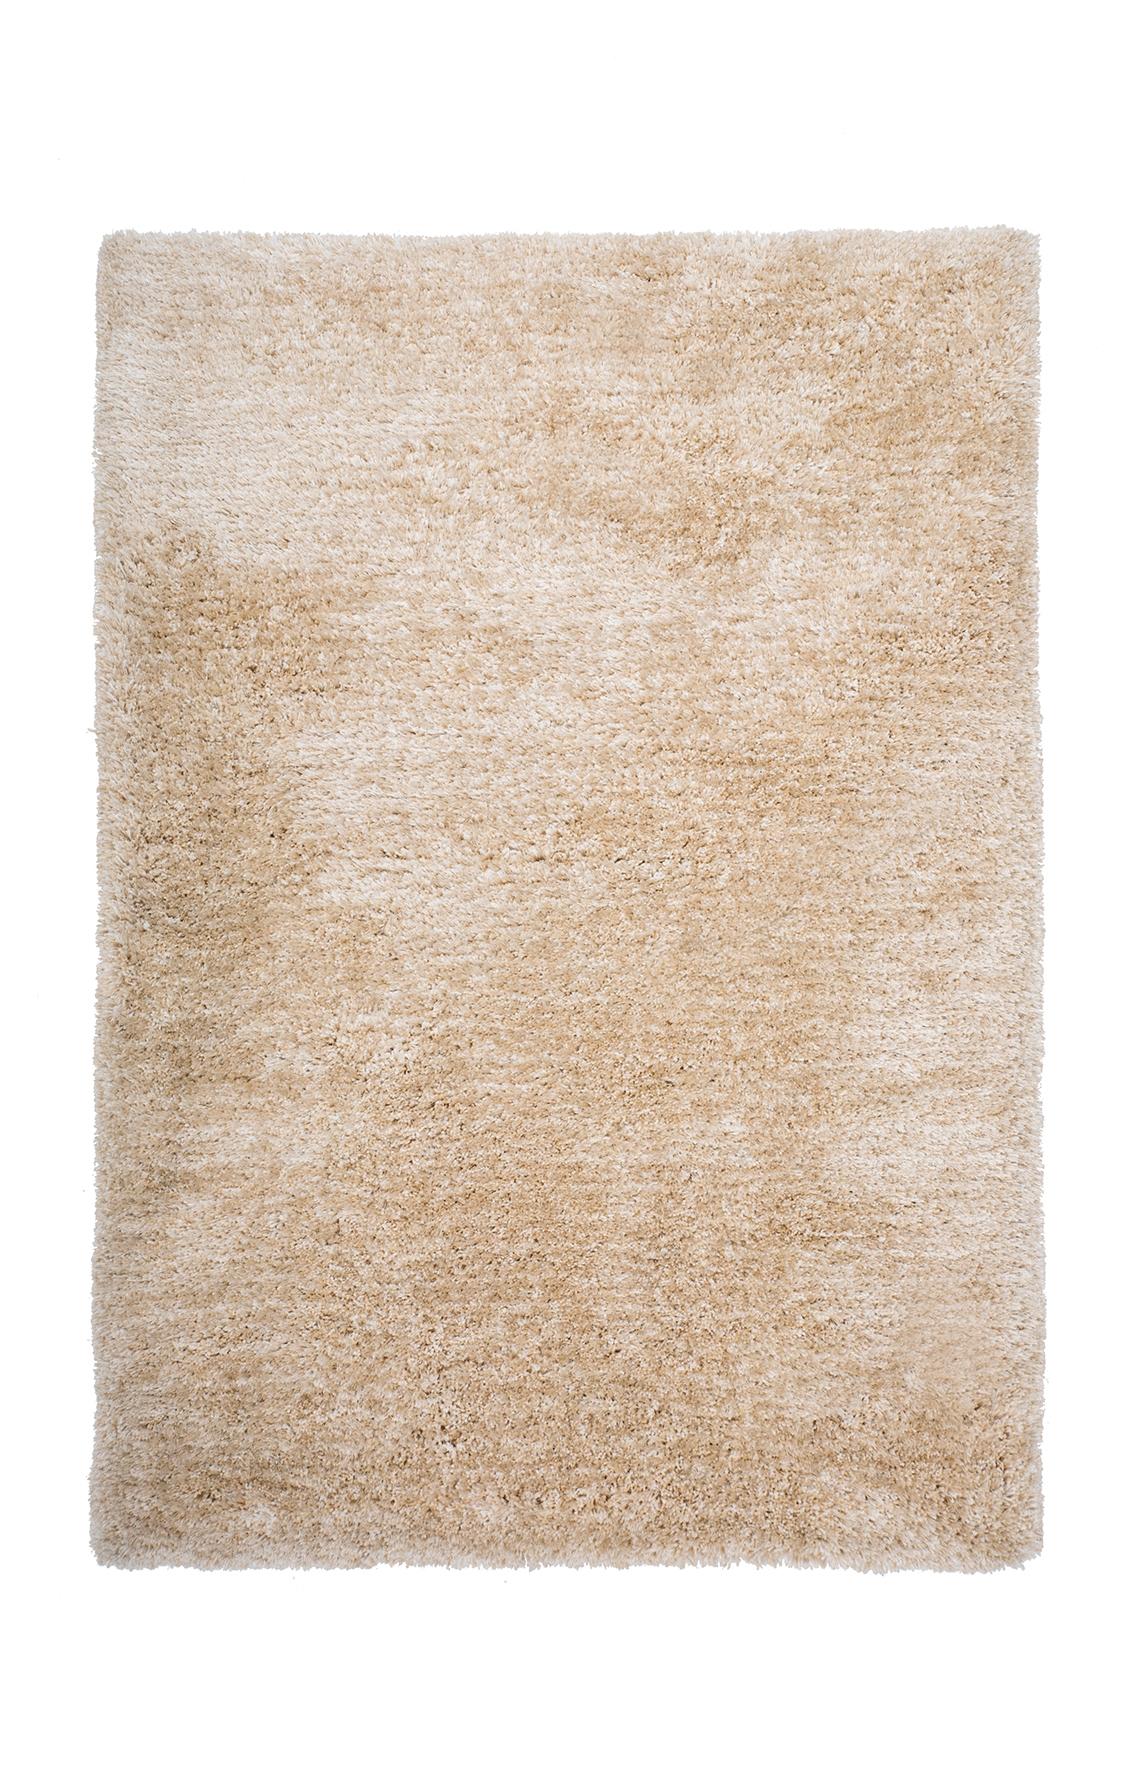 Obsession koberce Kusový koberec TENDENCE 666 SAND - 80x150 cm Expres